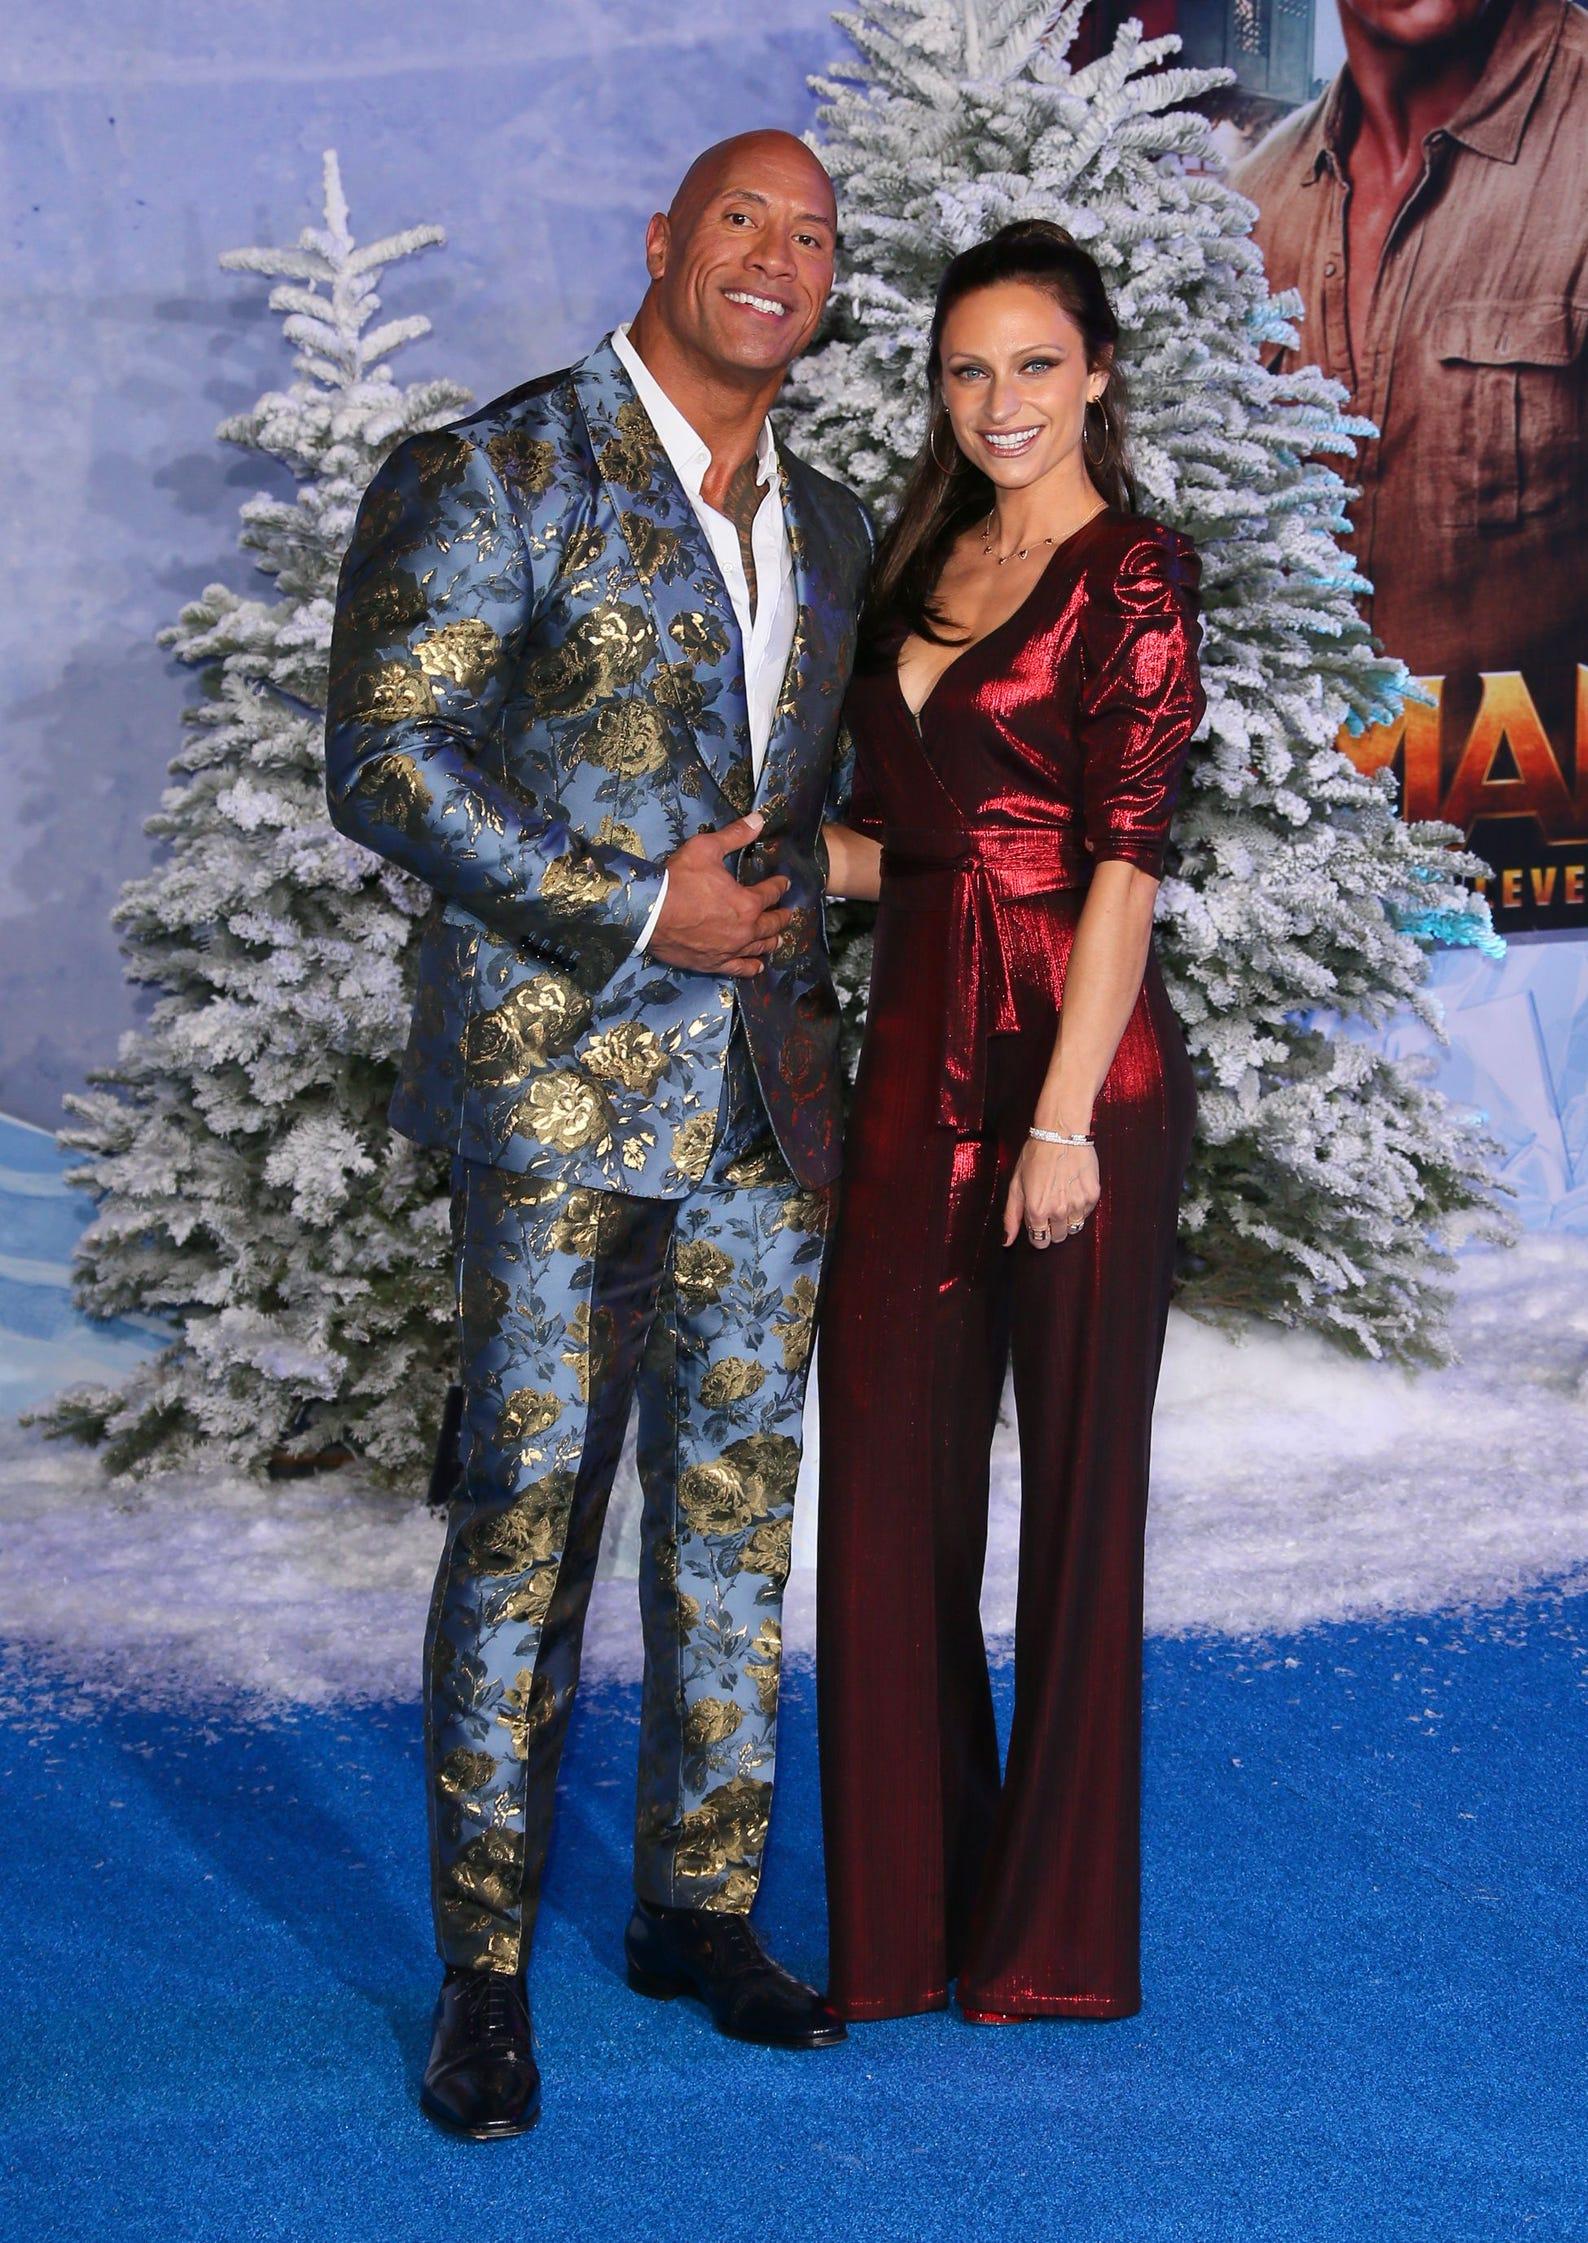 Jumanji The Next Level Dwayne Johnson Poses With Wife